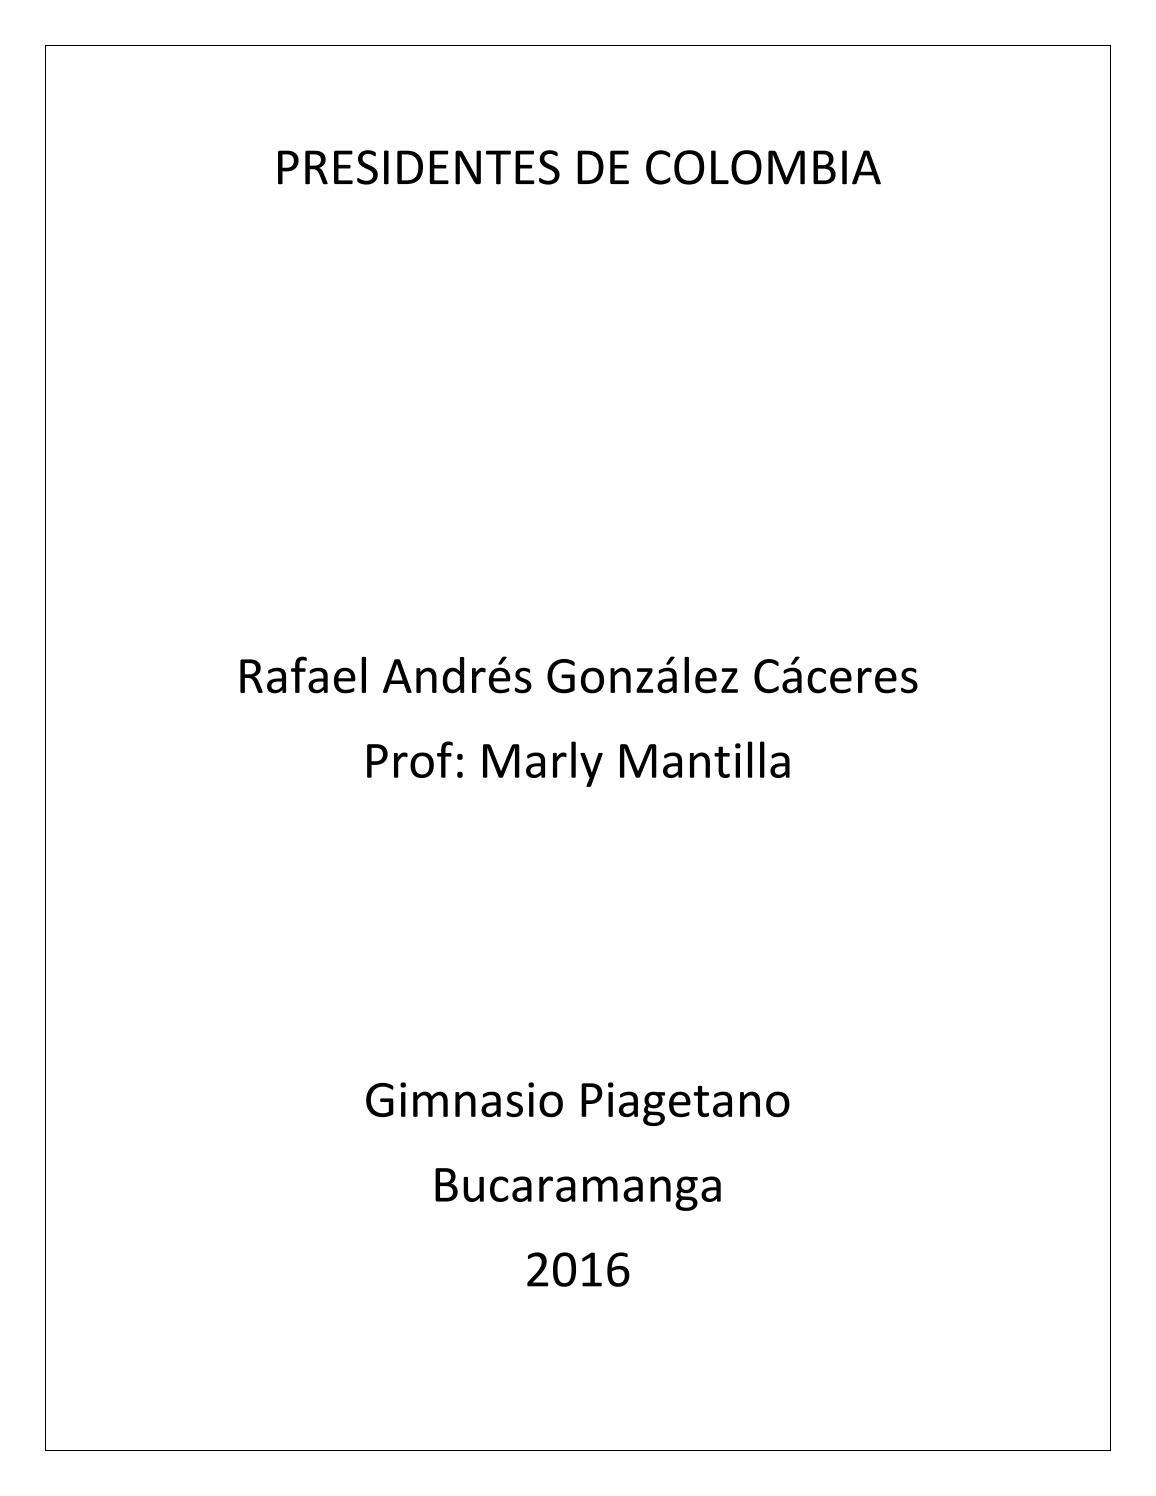 Presidentes de colombia by Rafael Gonzalez - issuu